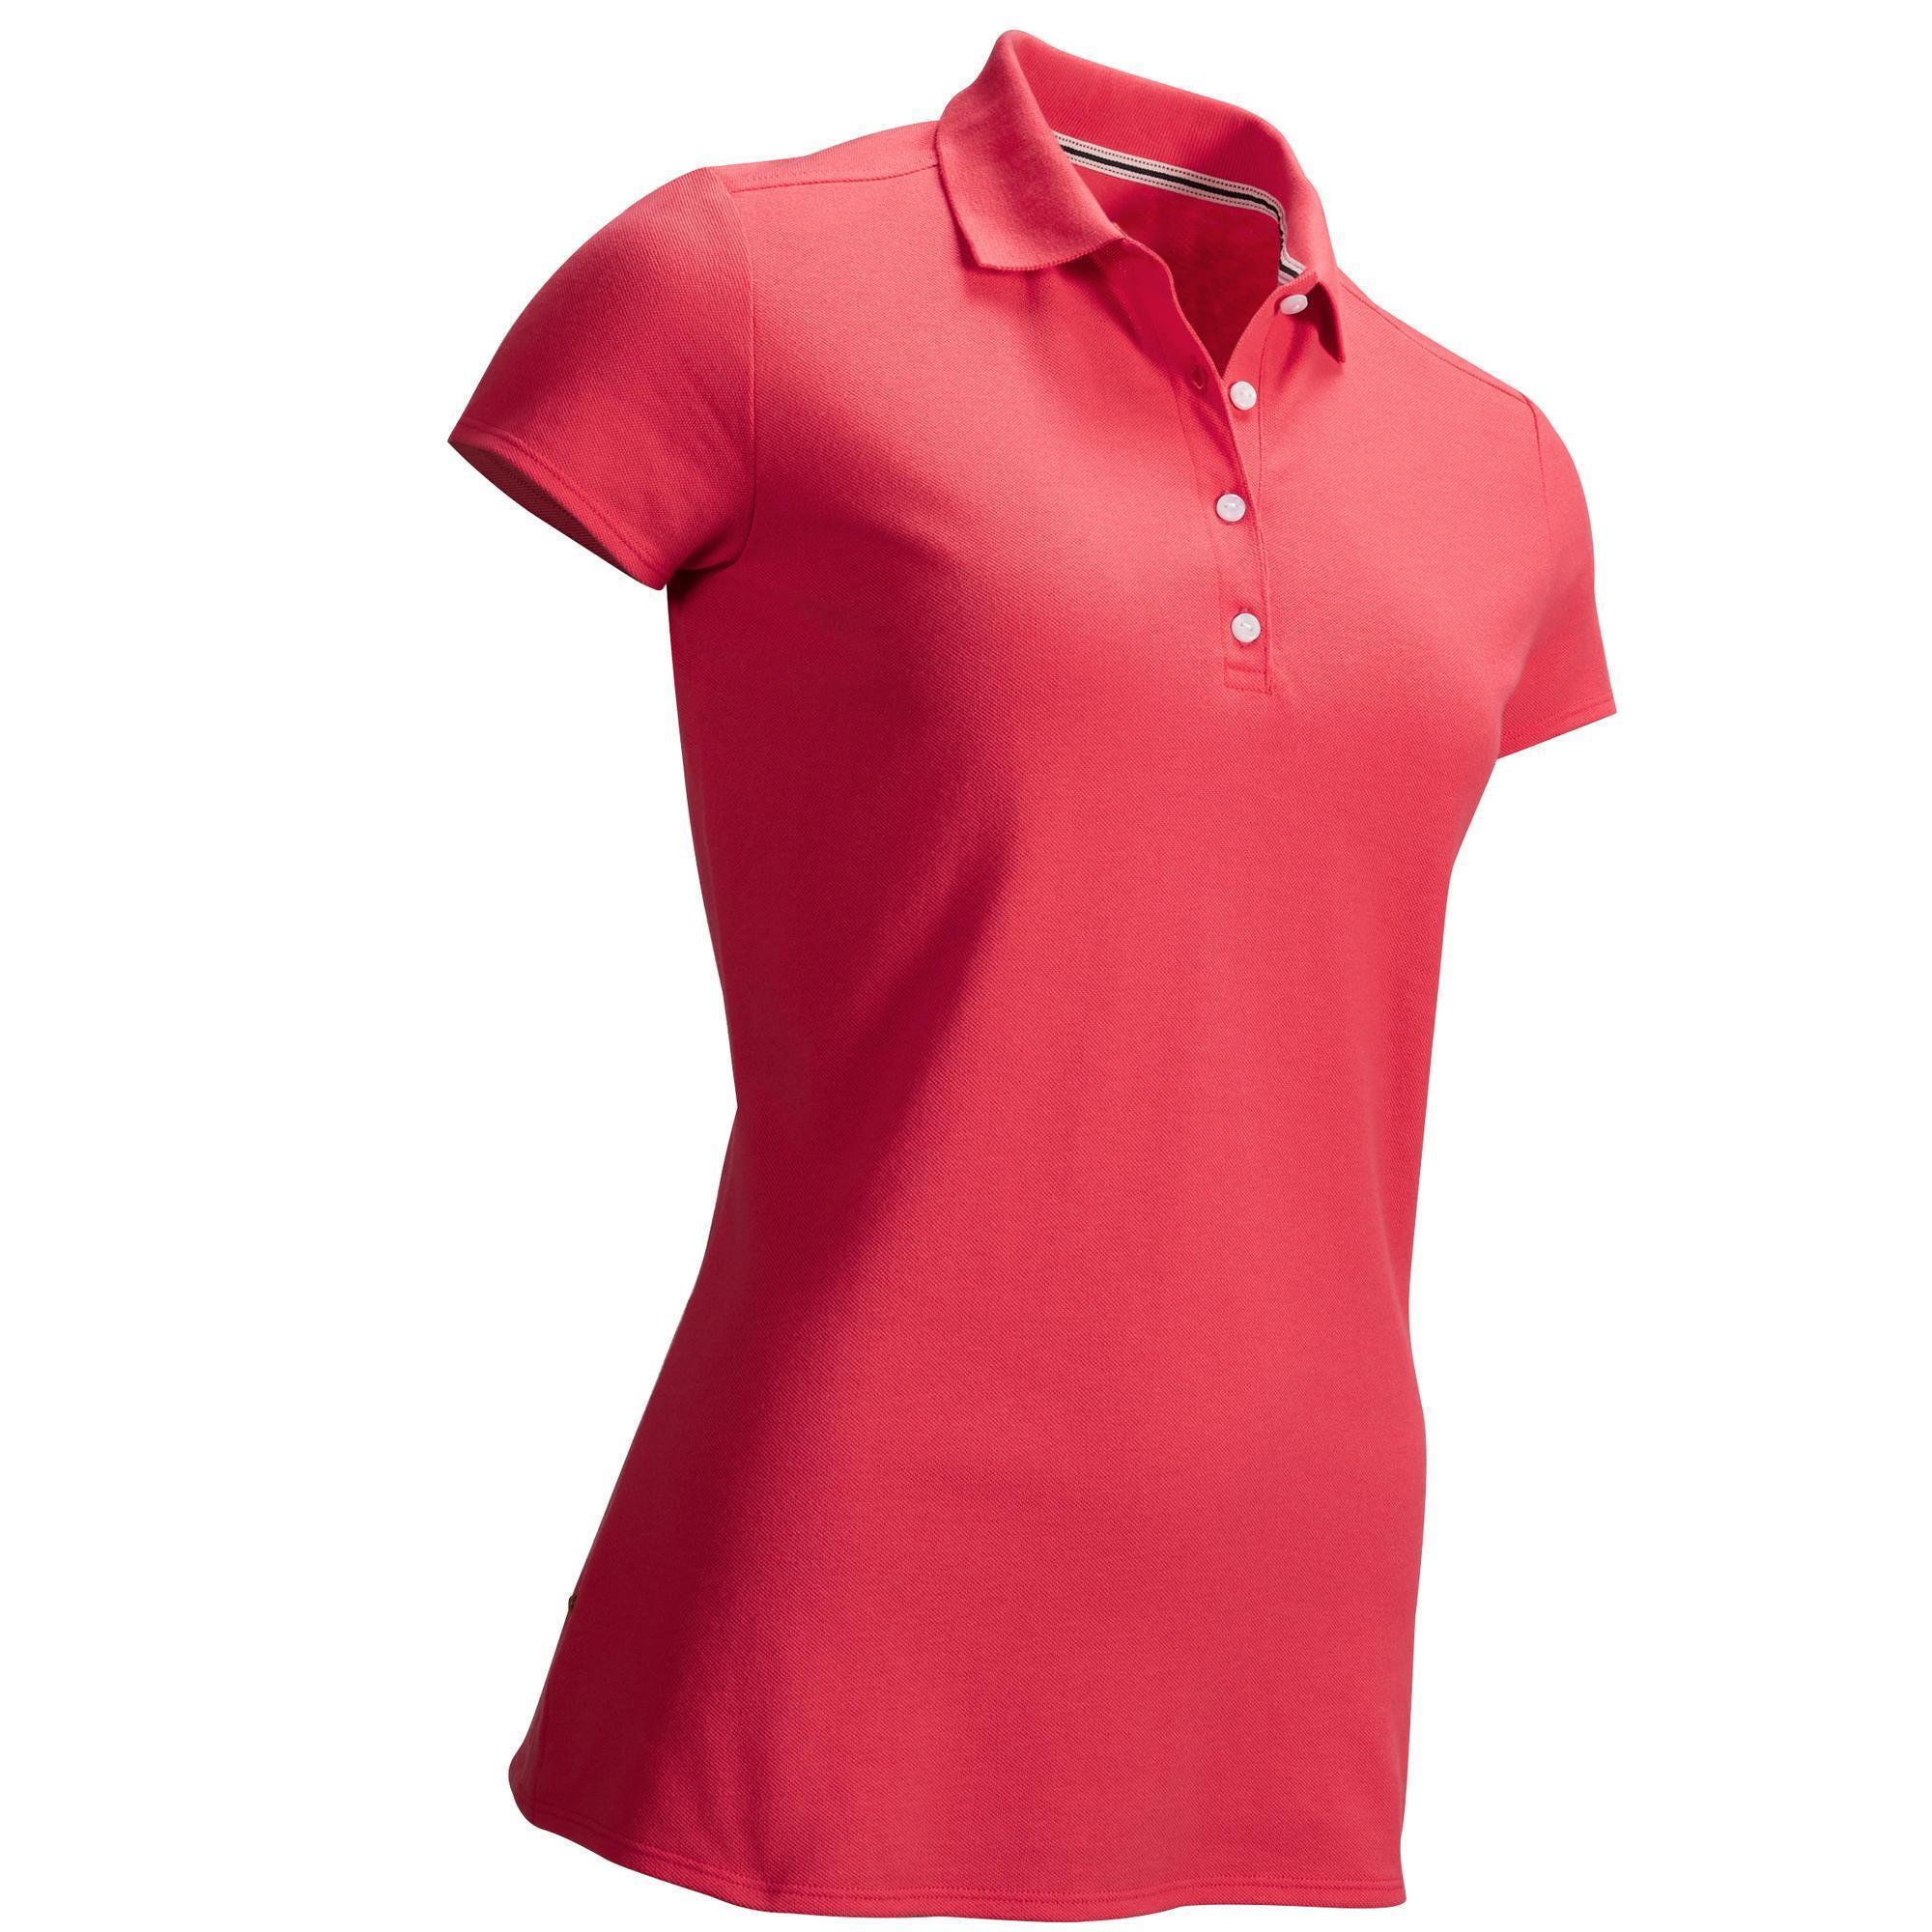 polo de golf manche courte femme temps tempere rose fraise inesis golf. Black Bedroom Furniture Sets. Home Design Ideas